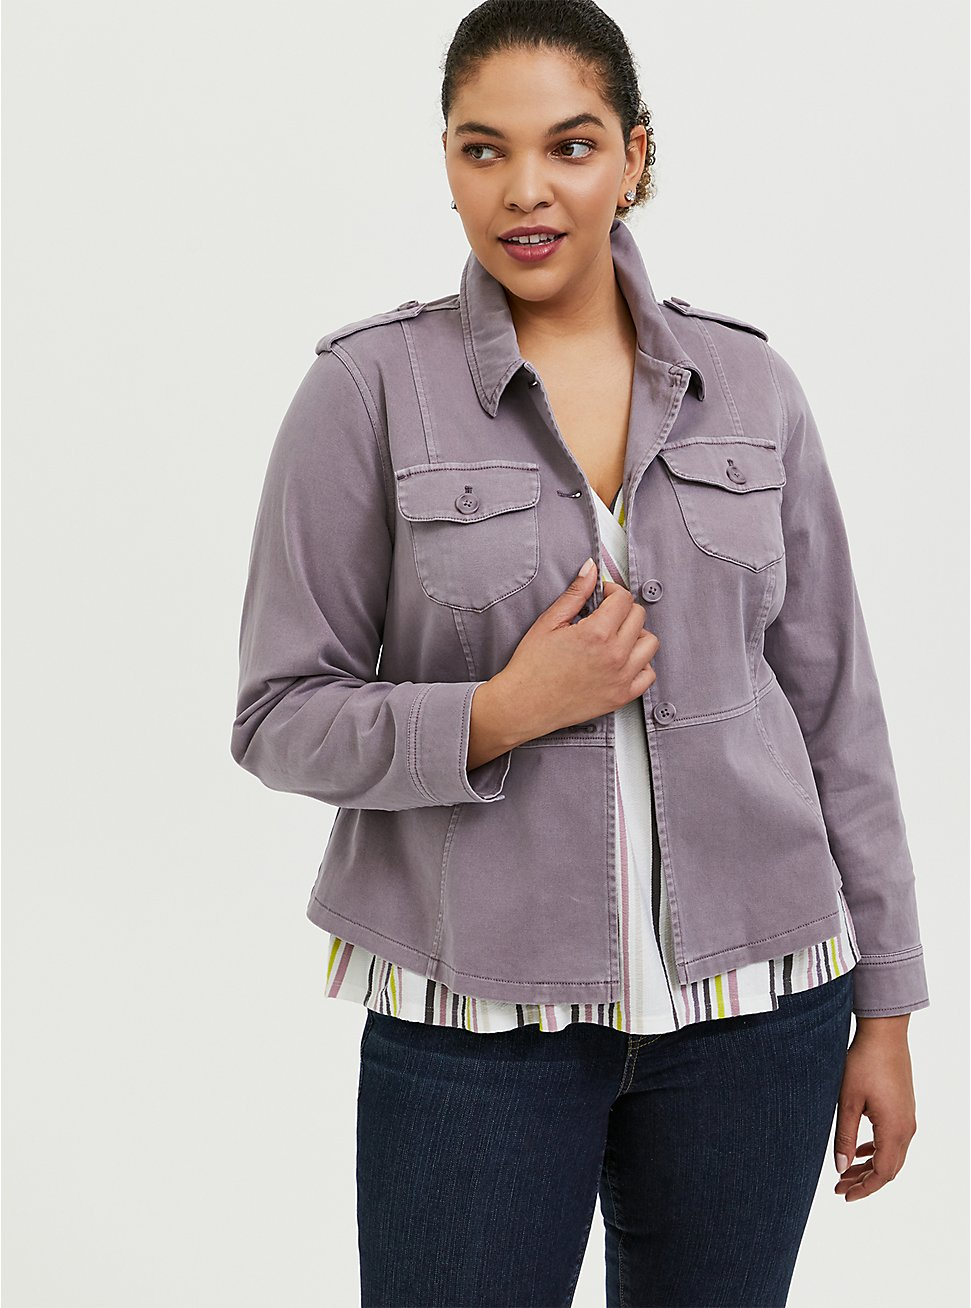 Slate Grey Twill Peplum Utility Jacket, , hi-res